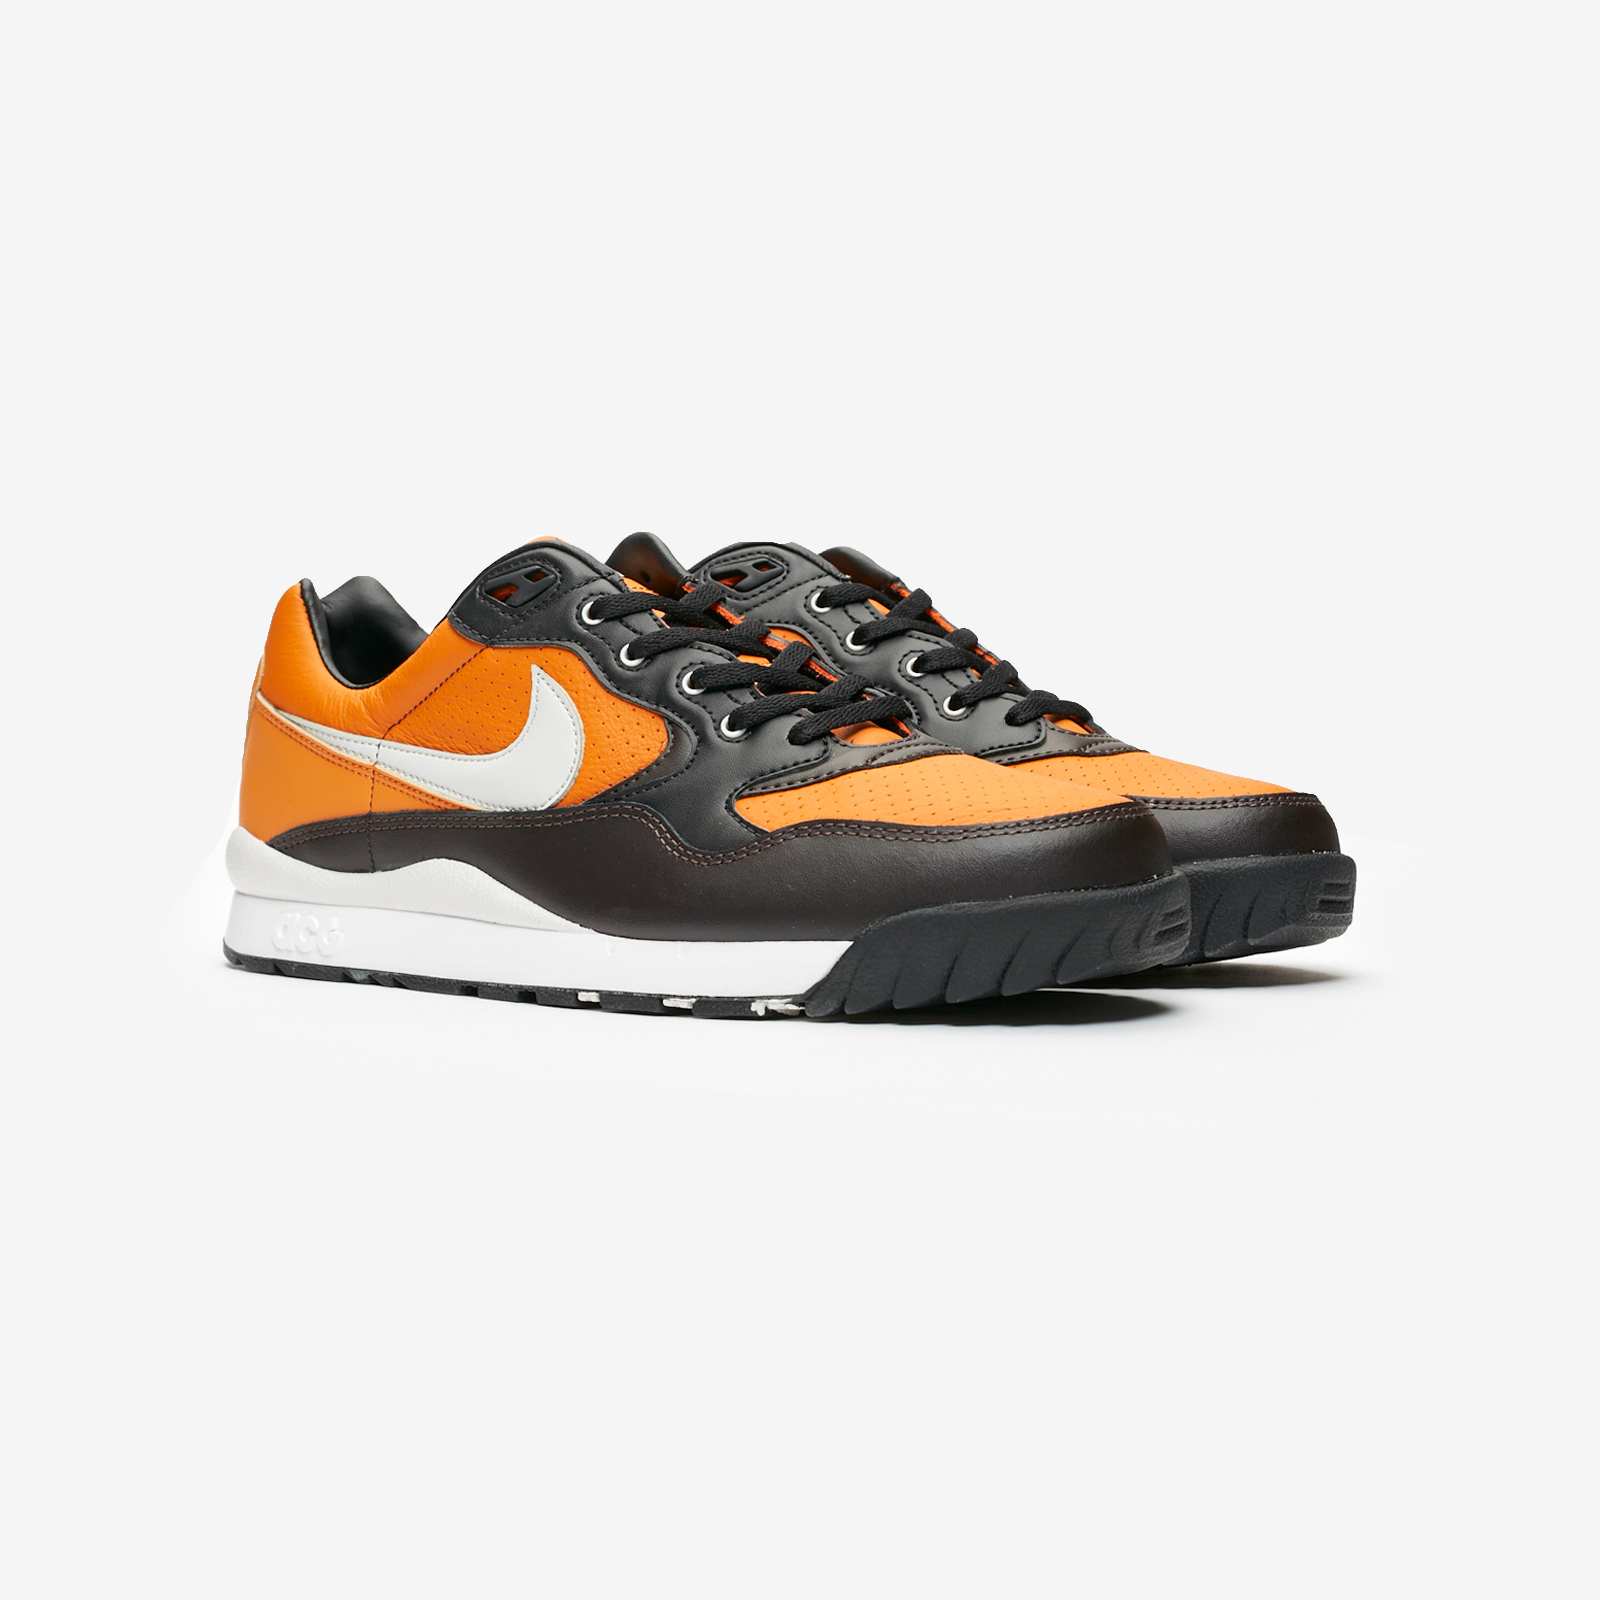 Nike ACG Air Wildwood (black orange) AO3116 800